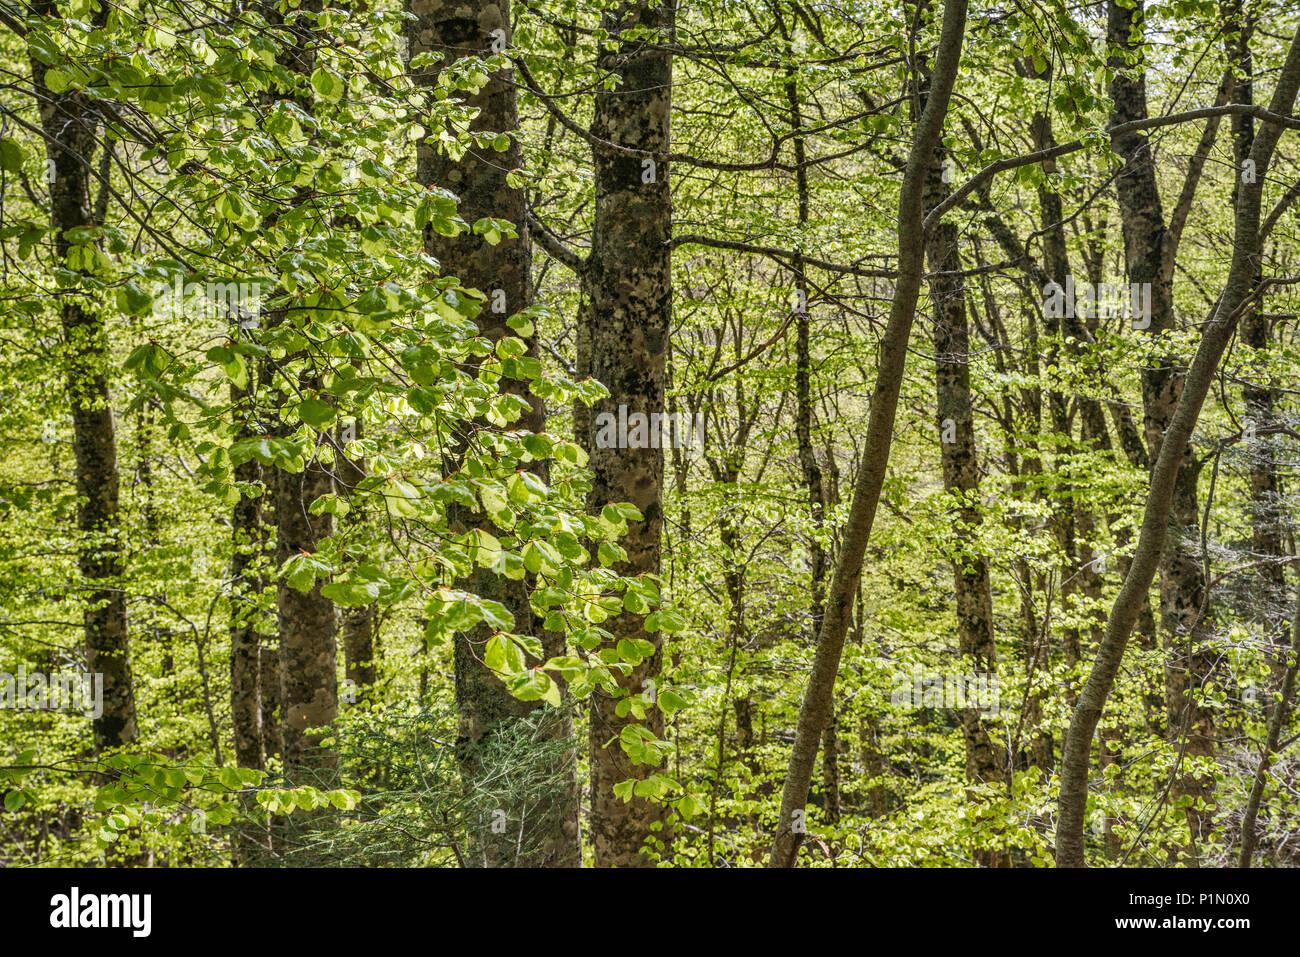 Die Buche (Fagus sylvatica) Wald, Nationalpark Aspromonte, Kalabrien, Italien Stockbild